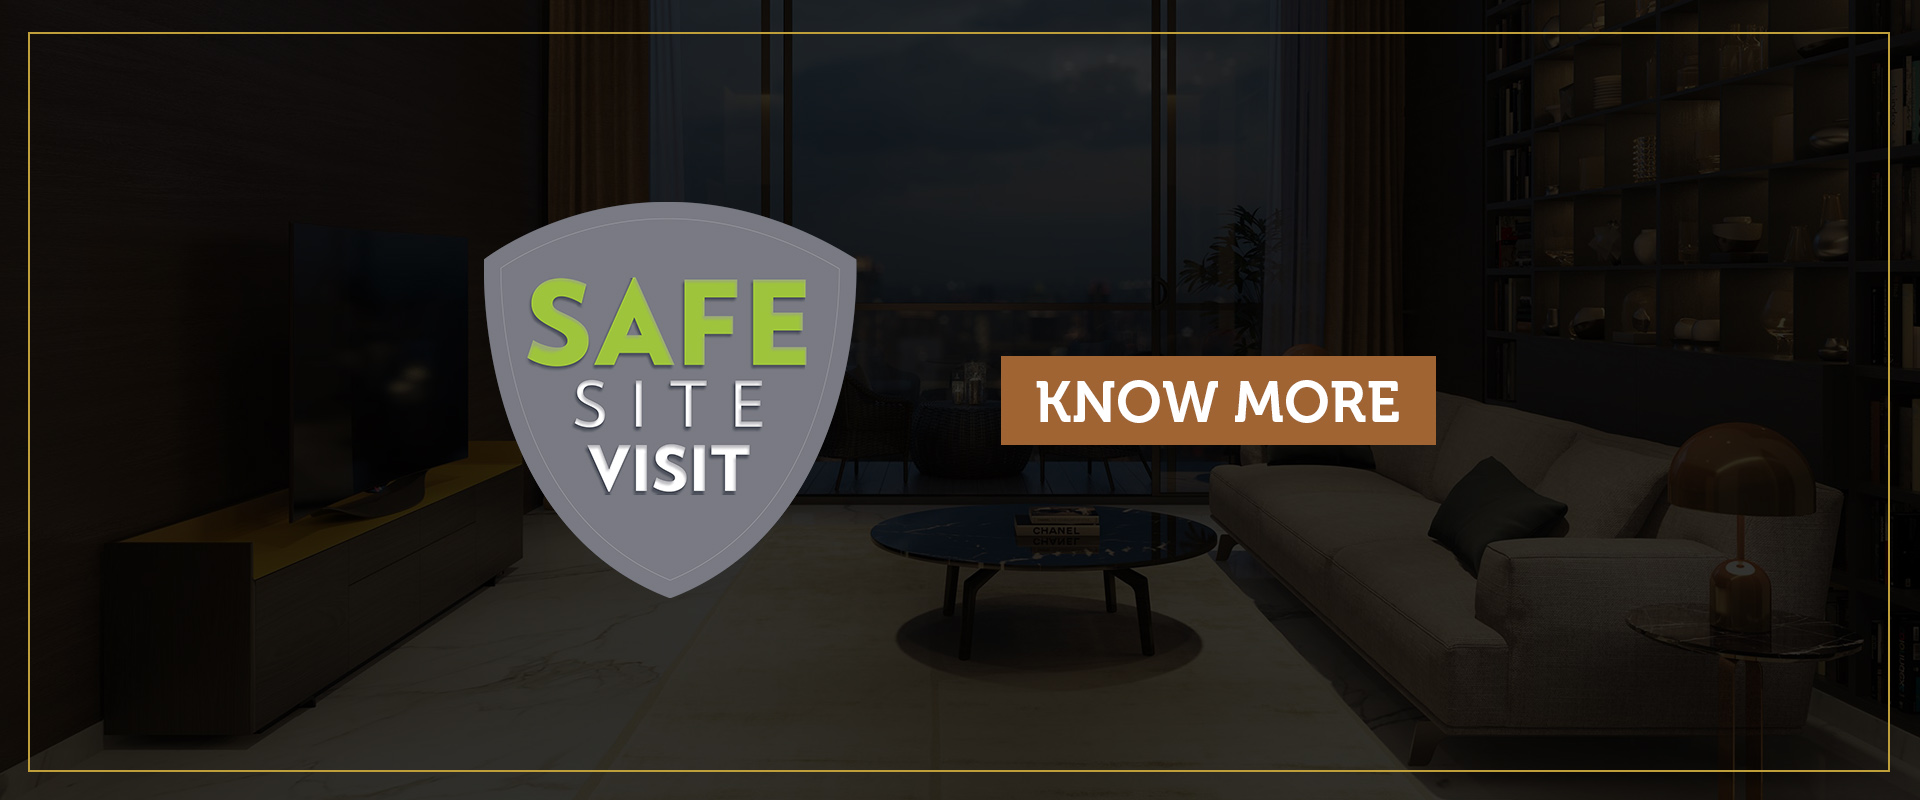 Safe site visit protocols | Apostrophe Moshi